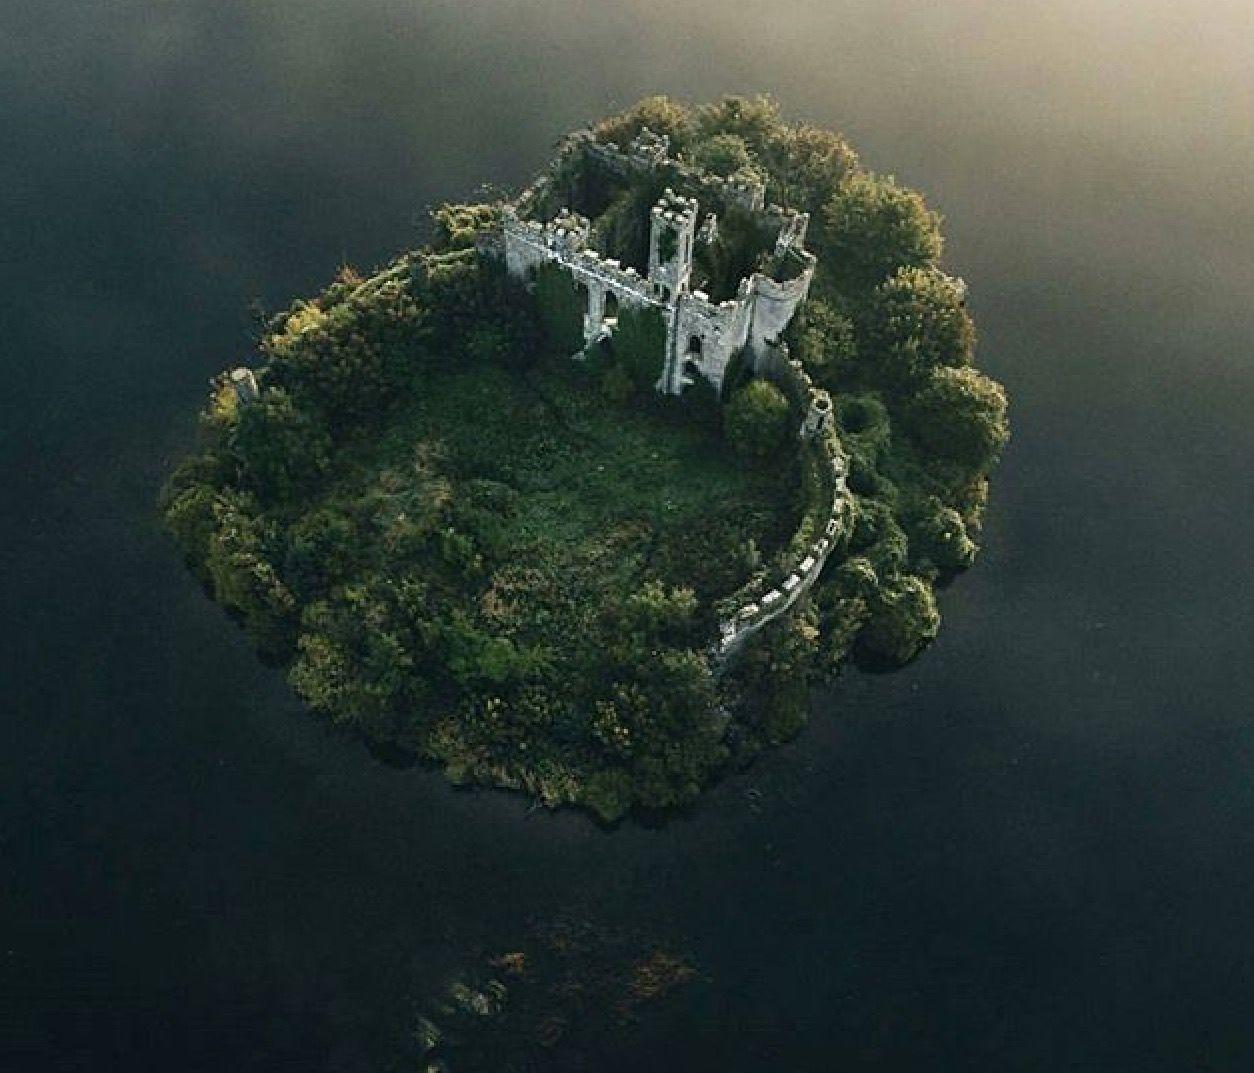 The Ruins Of McDermott's Castle, Lough Key, Ireland